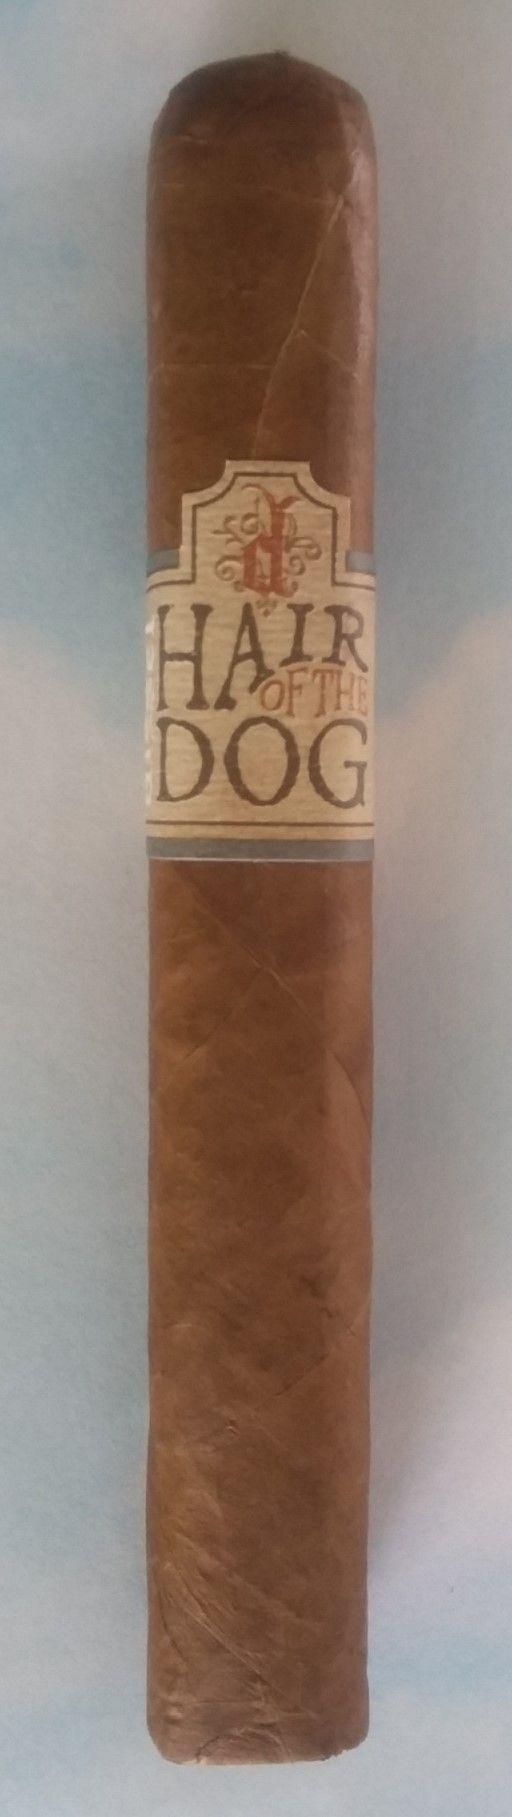 Diesel Hair of the Dog Cigar